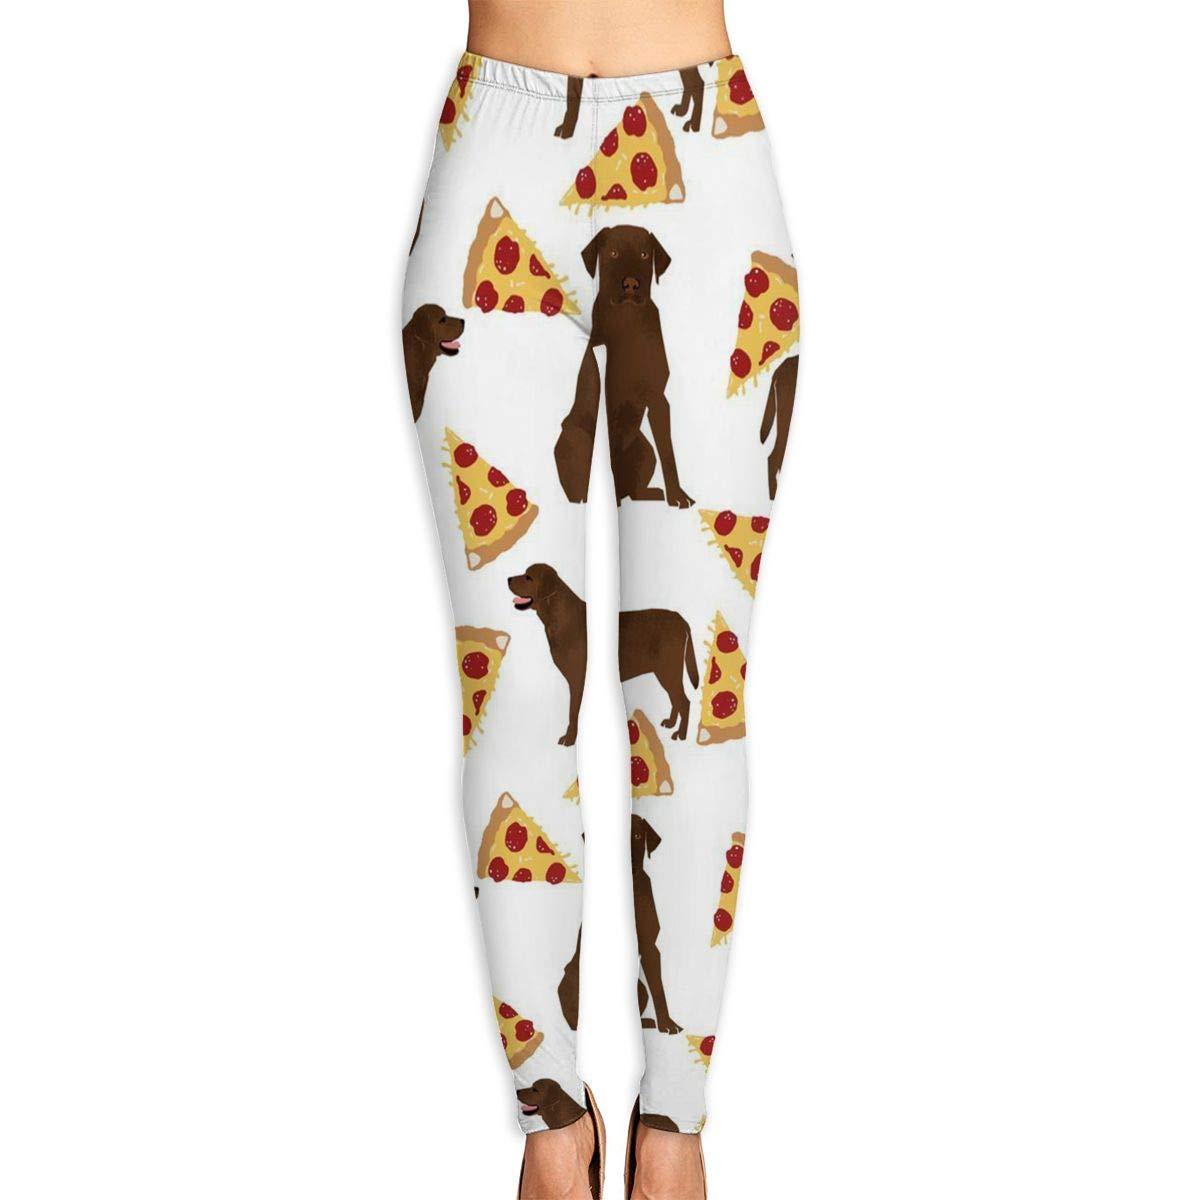 bc8dfb8376e36 Amazon.com: SDEYR79 Chocolate Labrador Pizza Yoga Pants for Women Sport  Tights Workout Running Leggings: Clothing